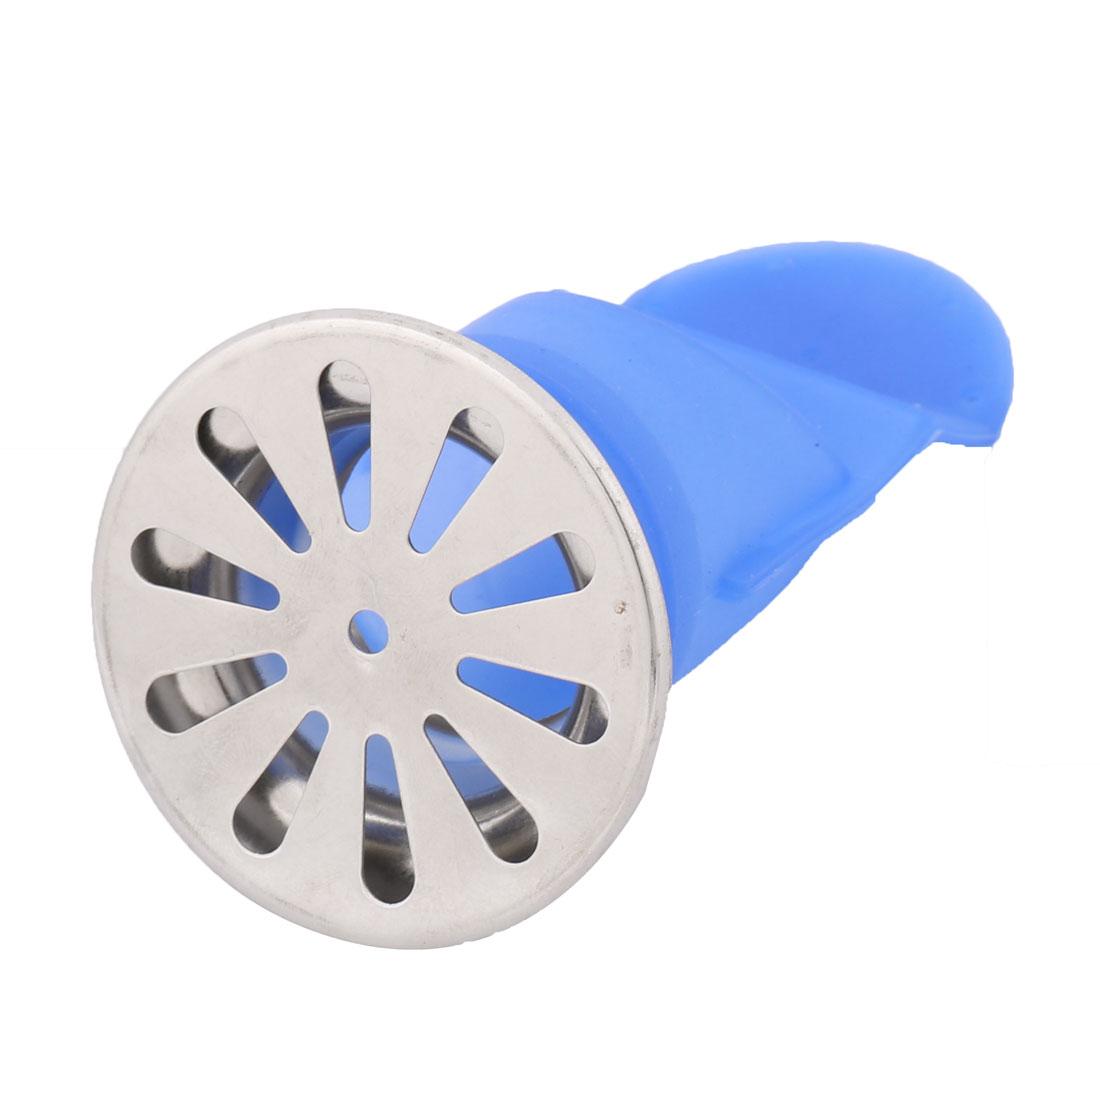 Bathroom Washing Machine Tub Basement Deodorized Strainer Floor Drain Core Set